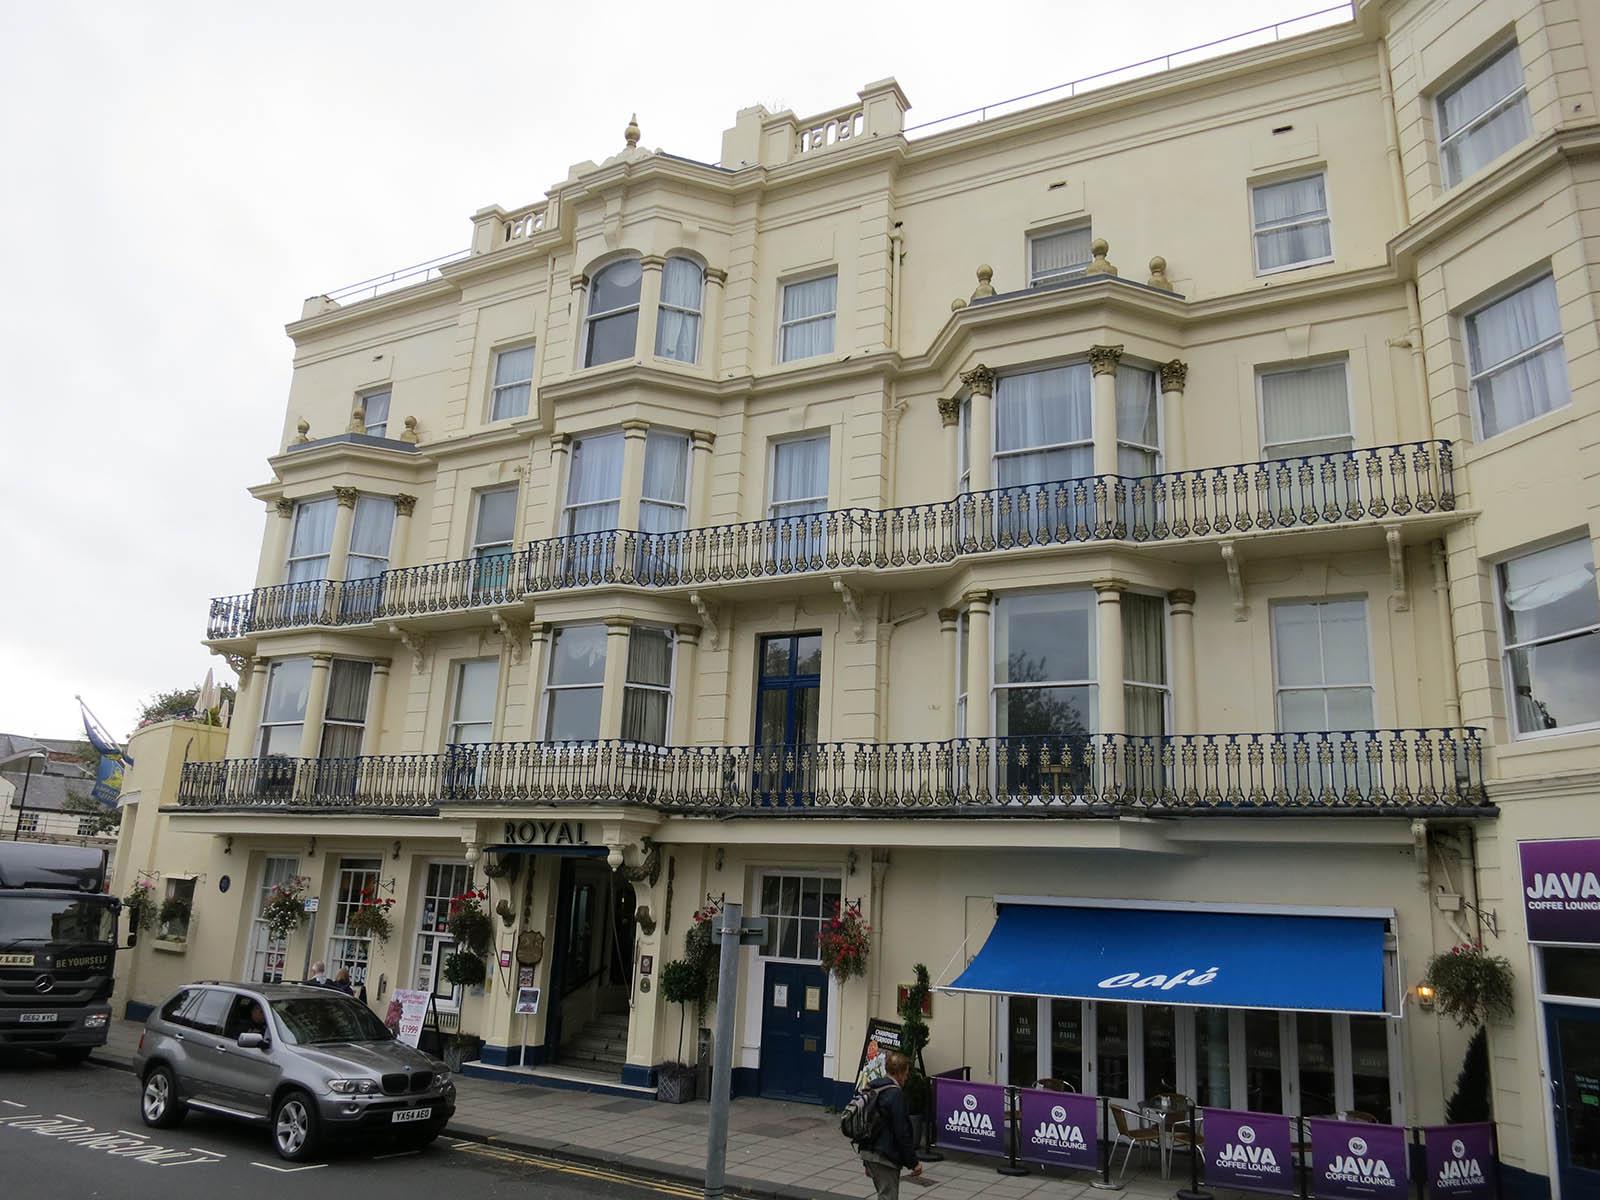 Royal Hotel, Scarborough, Reino Unido